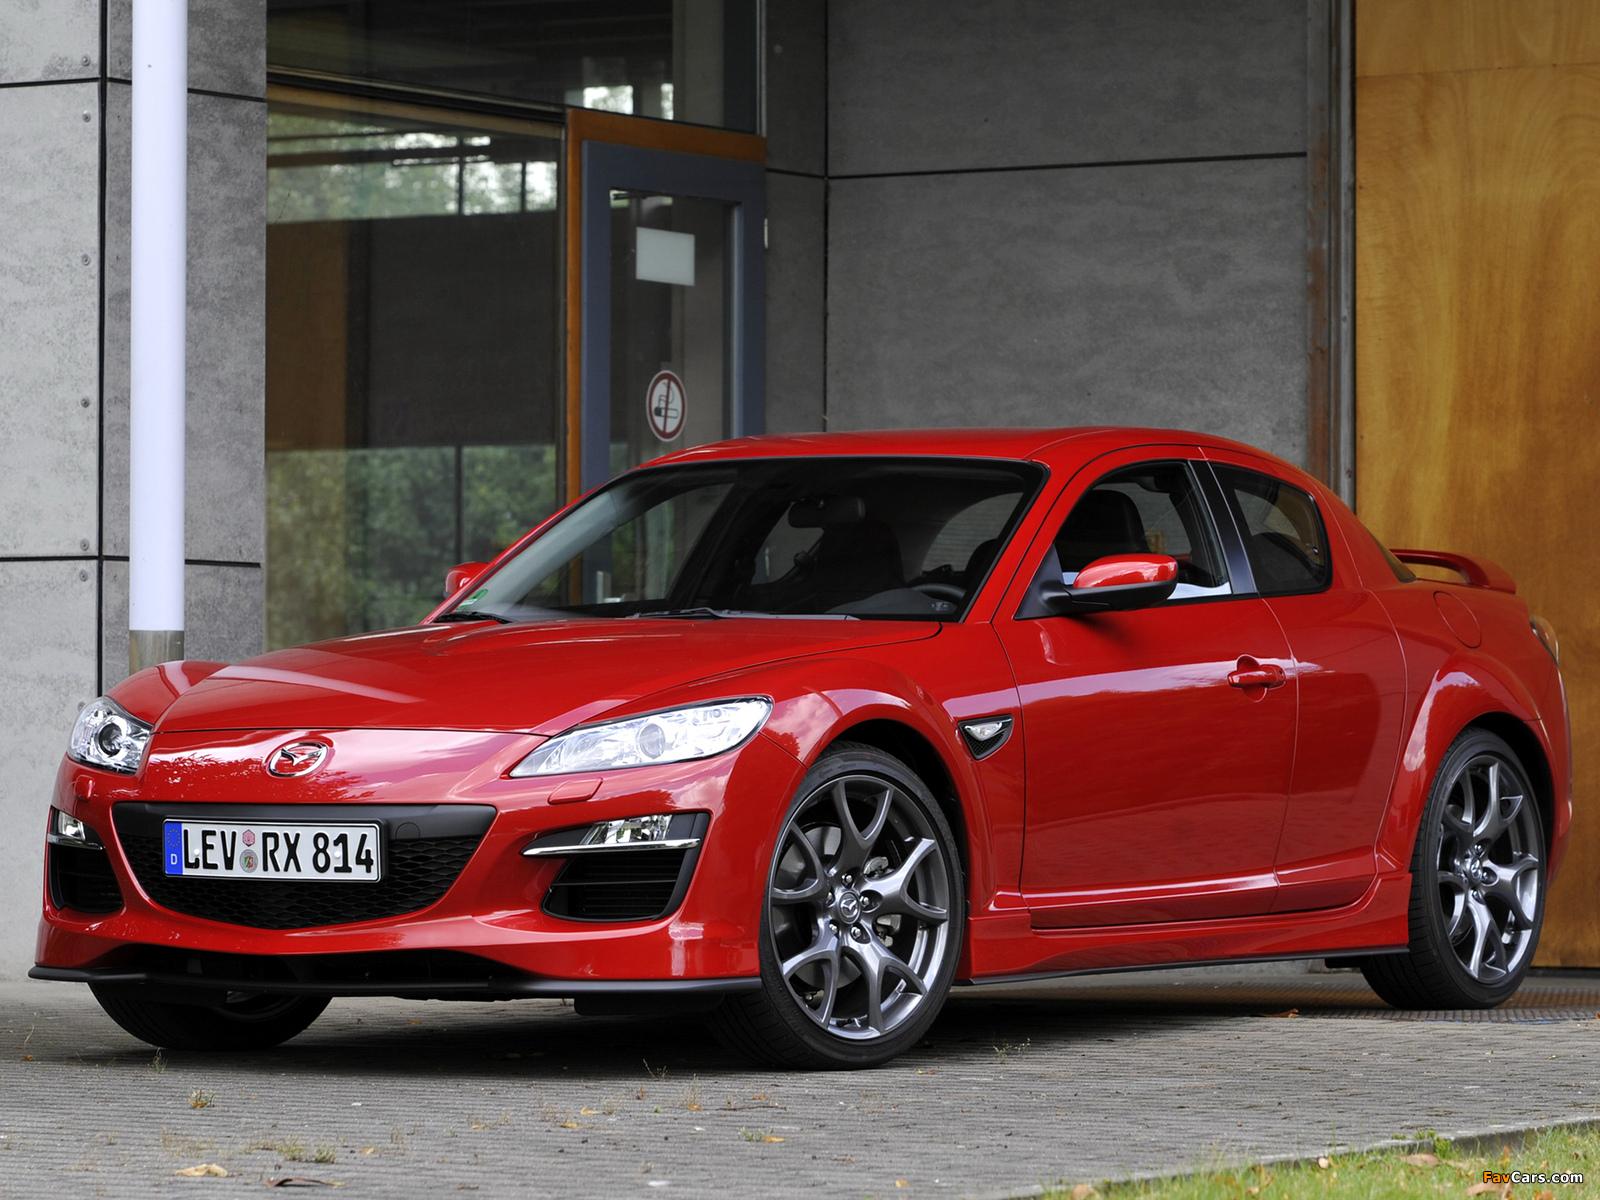 Kelebihan Kekurangan Mazda R3 Review